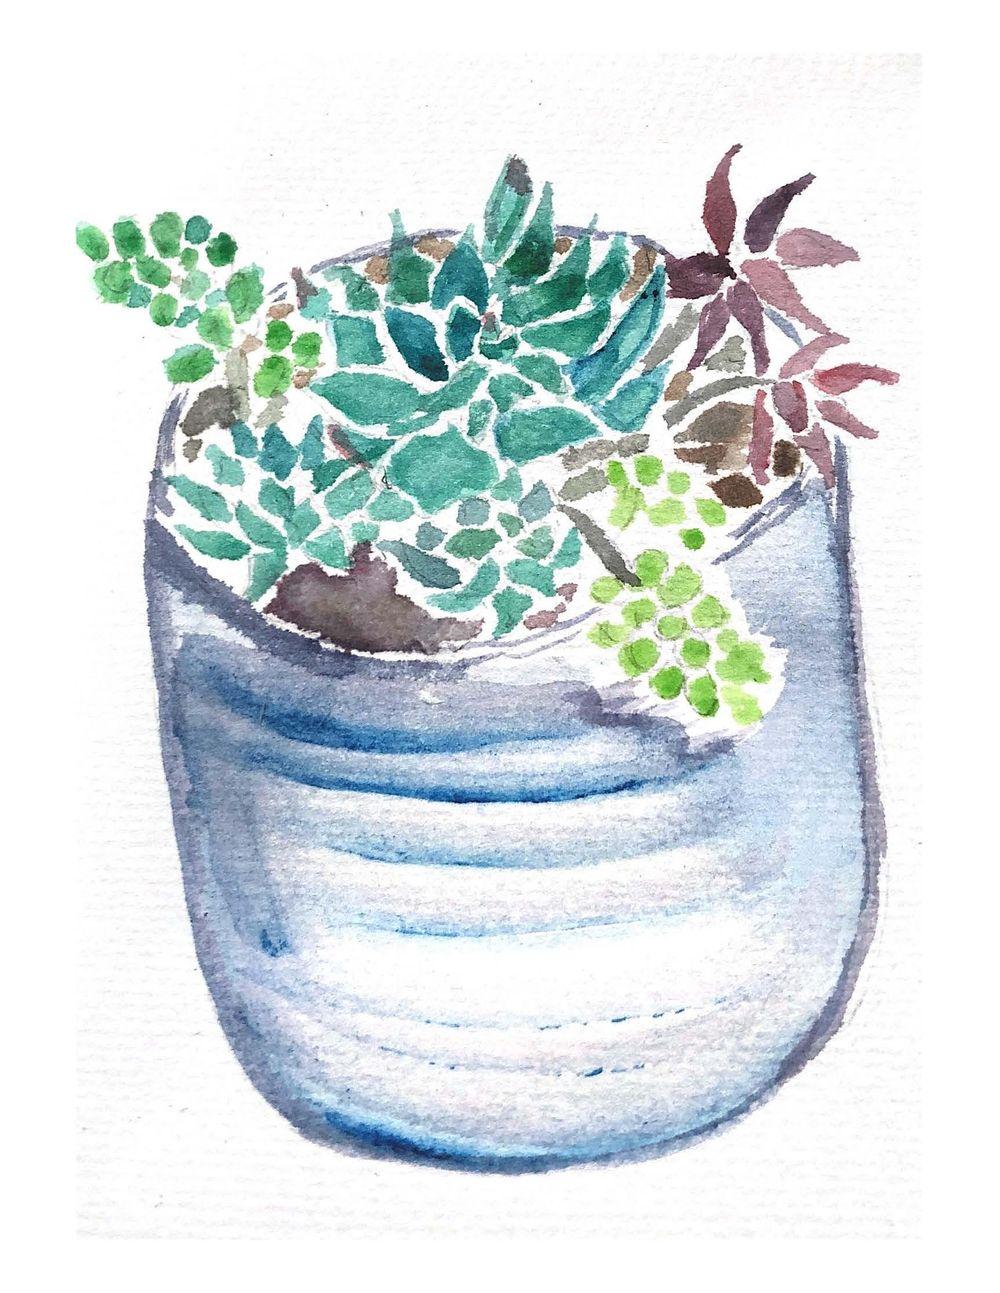 Succulents-K. Arista - image 1 - student project